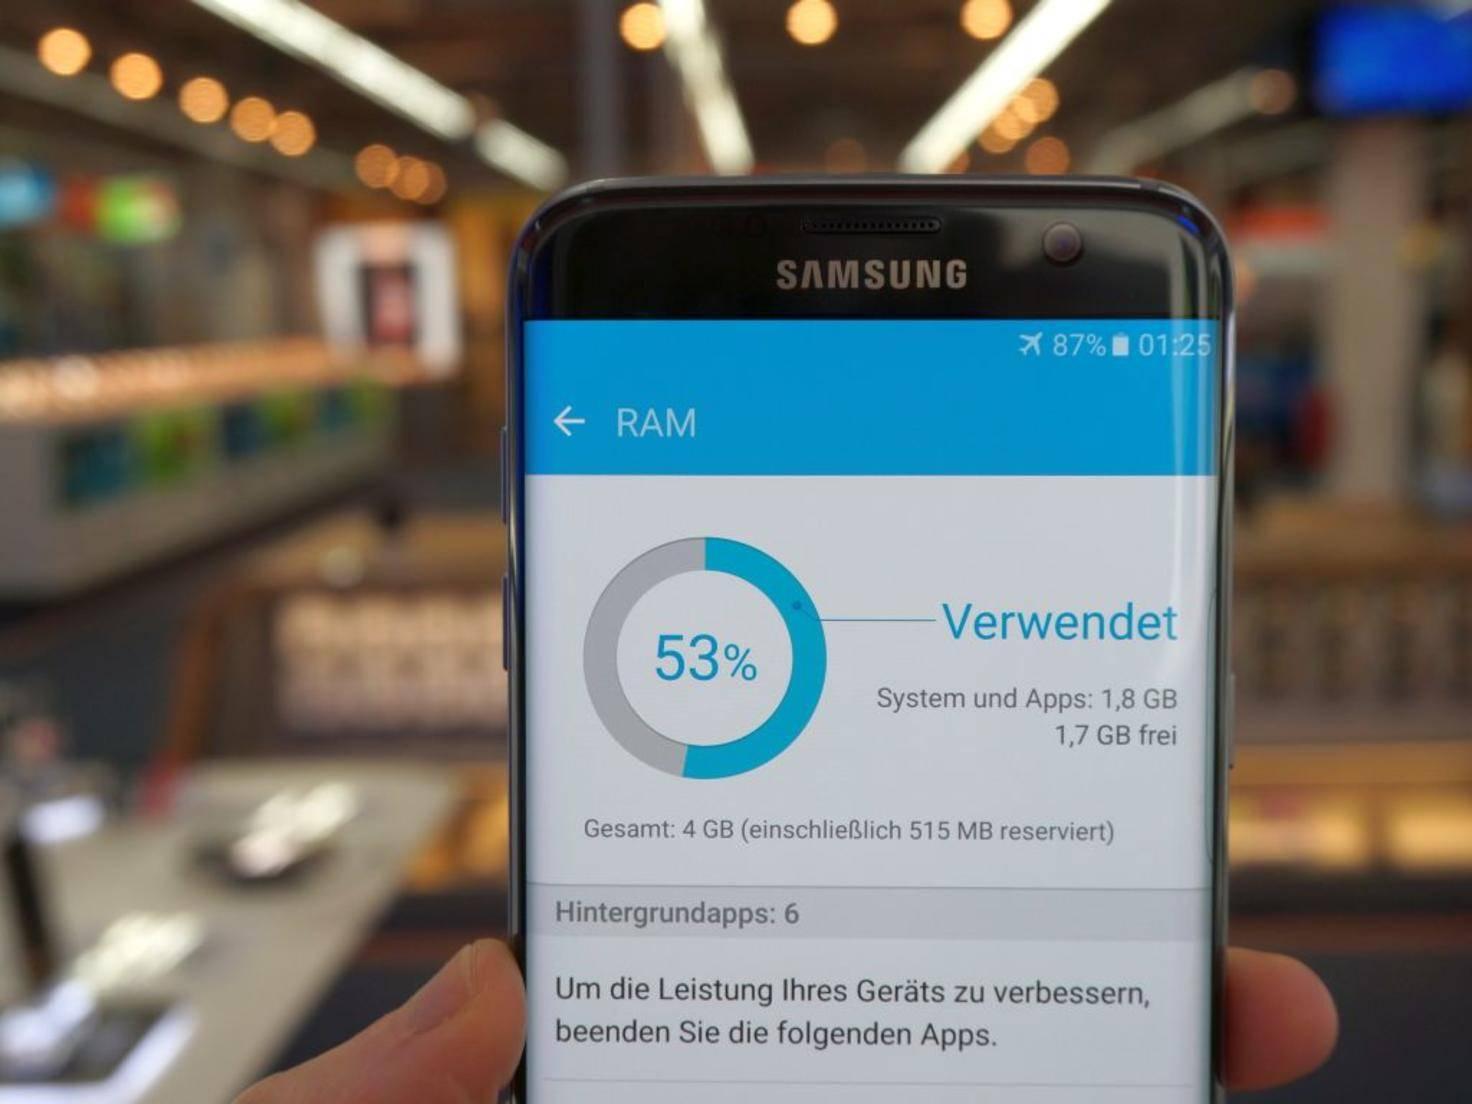 Im Galaxy S7 Edge stecken 4 GB RAM.